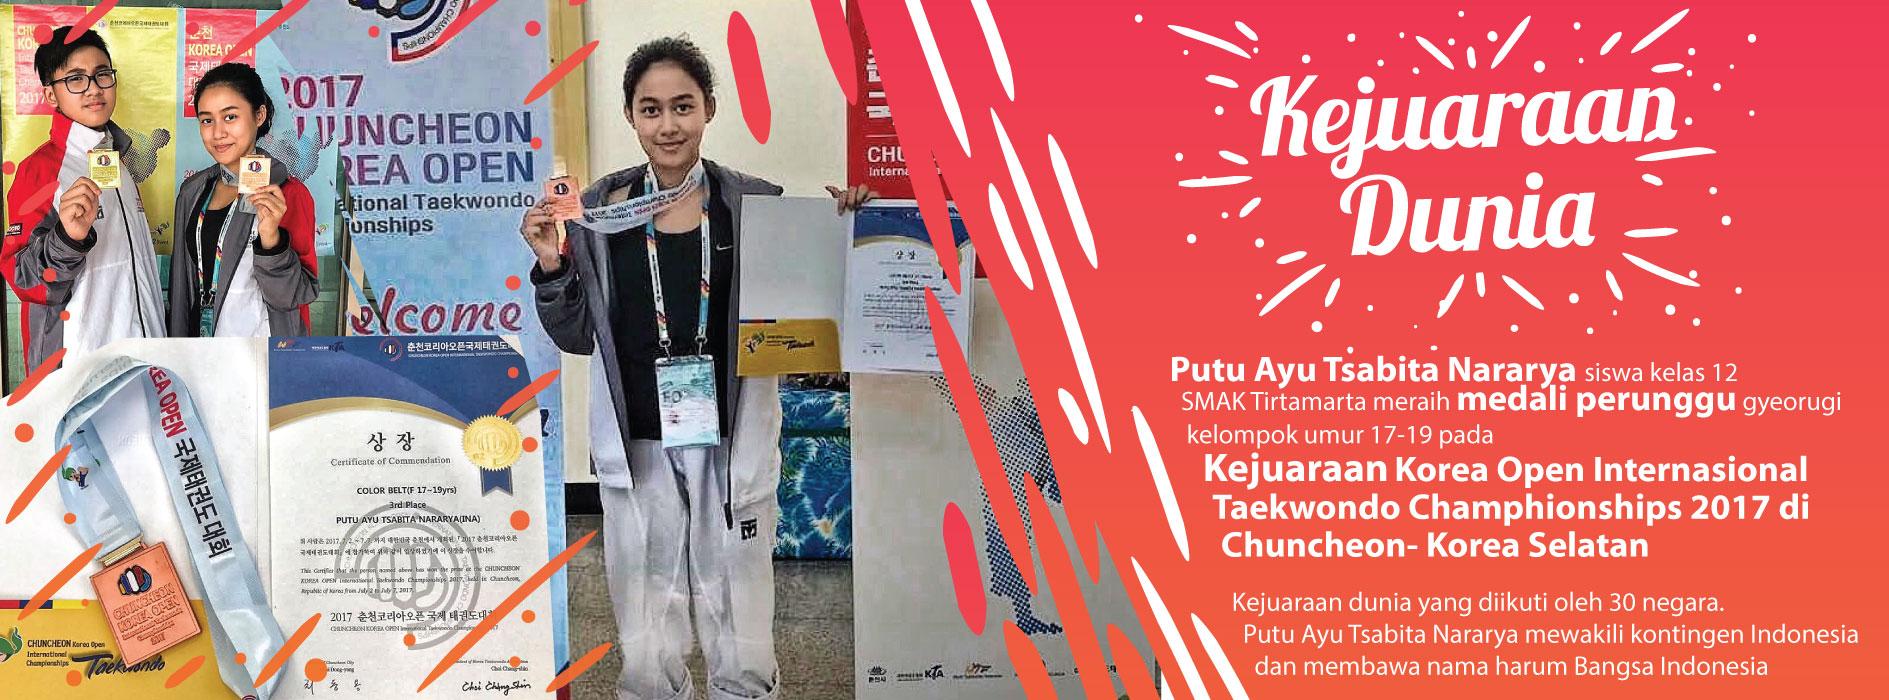 Putu Ayu Tsabita Nararya siswa kelas 12 SMAK Tirtamarta meraih medali perunggu gyeorugi kelompok umur 17-19 pada Kejuaraan Korea Open Internasional Taekwondo Champhionships 2017 di Chuncheon- Korea Selatan Kejuaraan dunia yang diikuti oleh 30 negara. Putu Ayu Tsabita Nararya mewakili kontingen Indonesia dan membawa nama harum Bangsa Indonesia